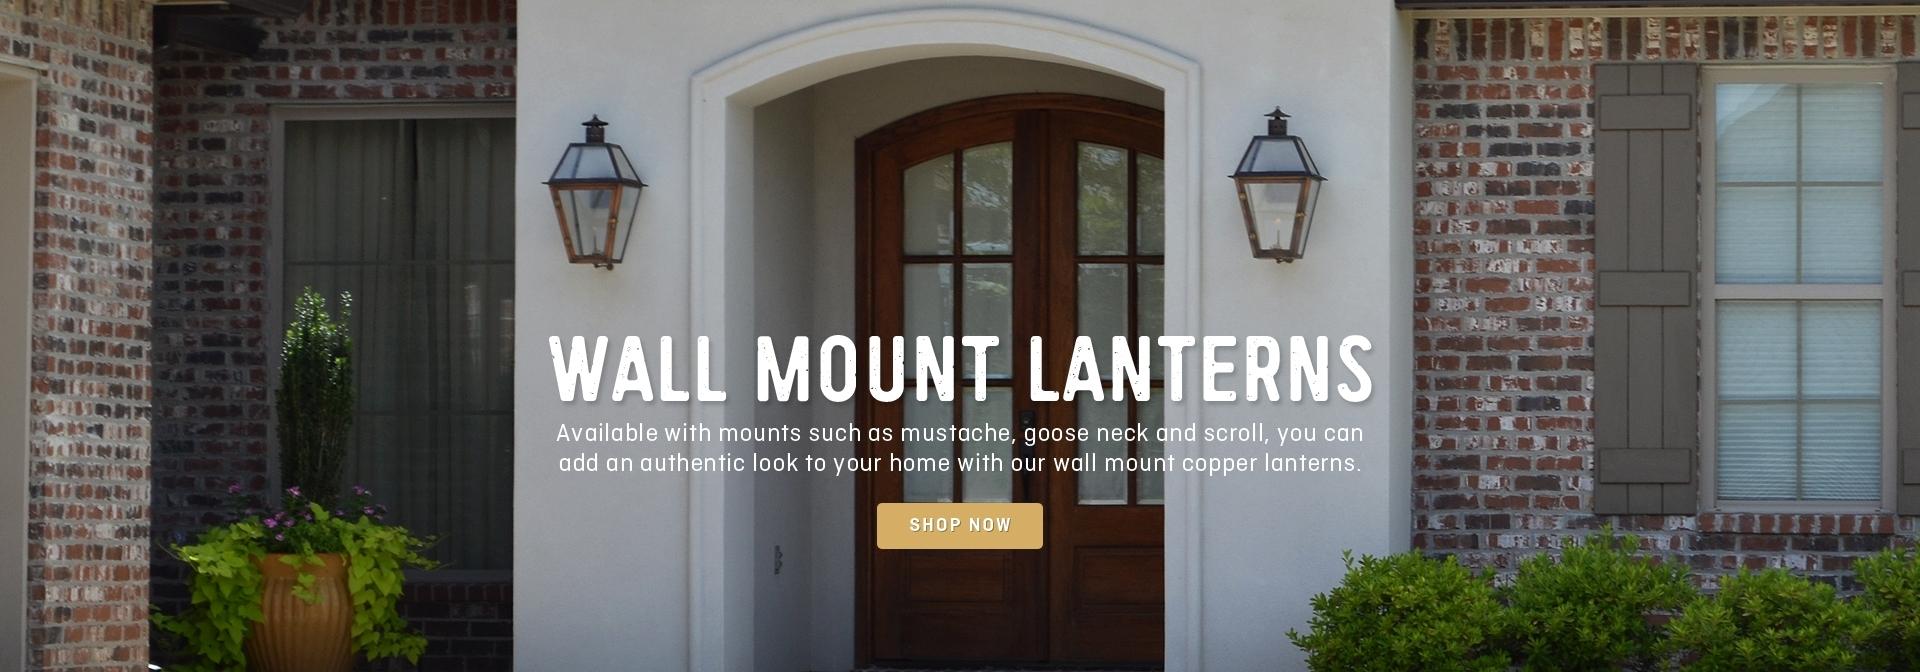 Authentic Outdoor Gas Lamps | 100% Satisfaction Guaranteed regarding Outdoor Gas Lanterns (Image 2 of 20)